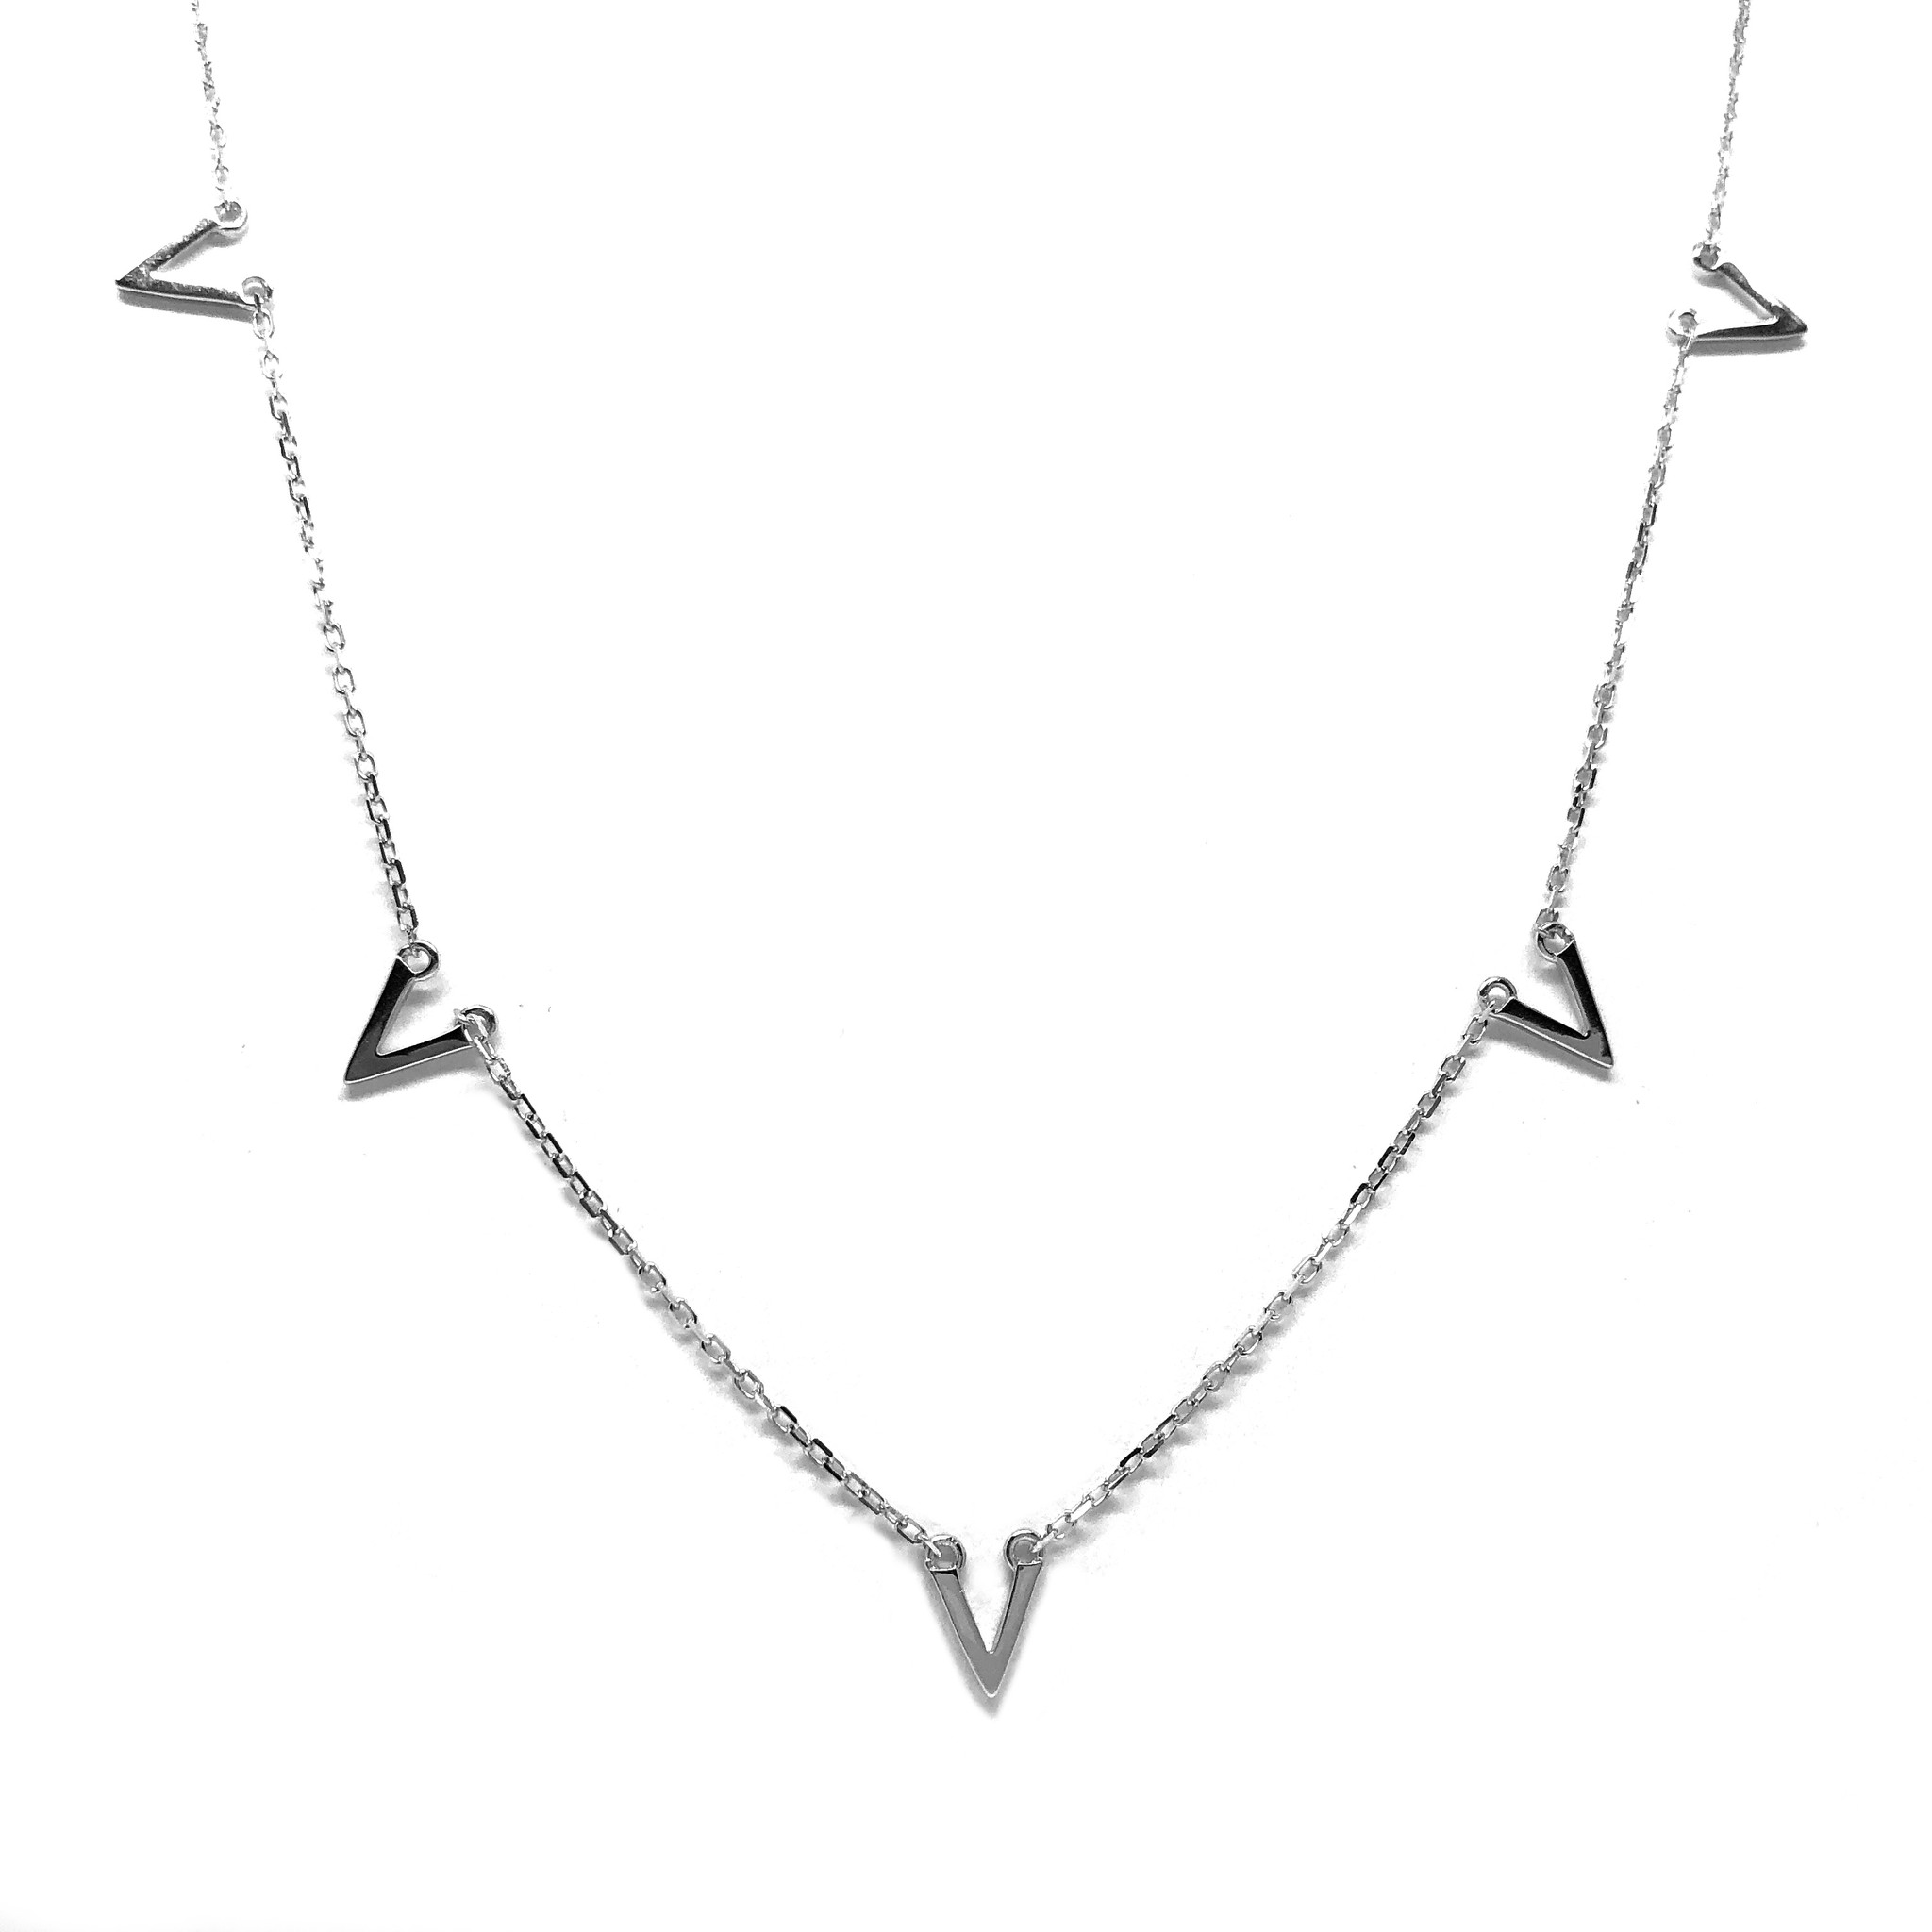 Zilveren V'tjes chevron ketting-1